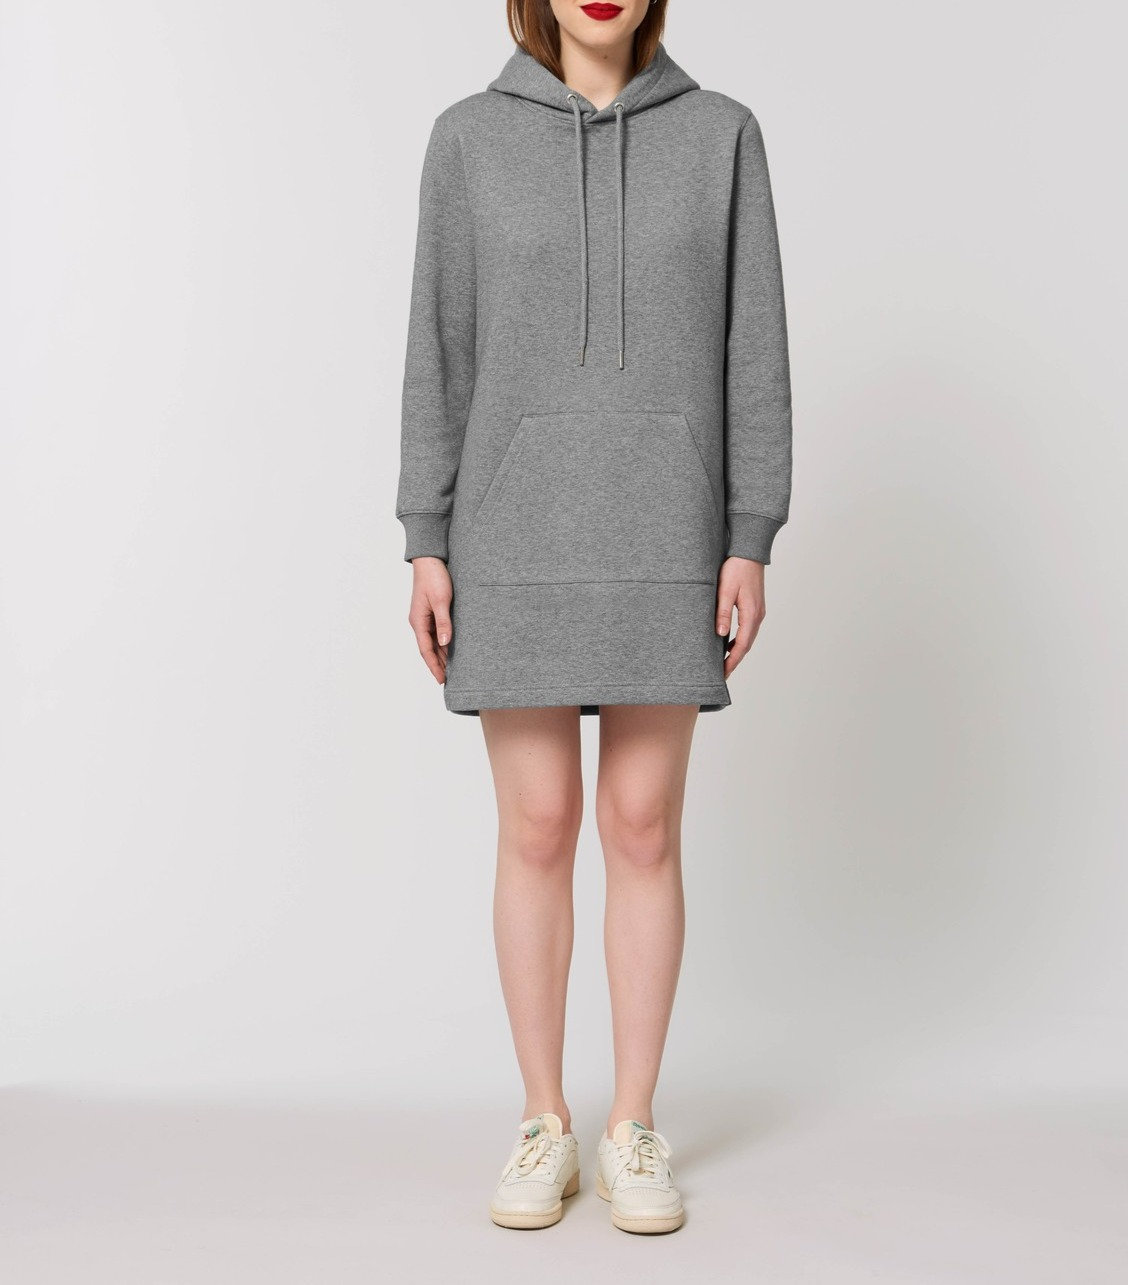 La Robe Sweat Shirt En Coton Bio A Capuche Human And Tee